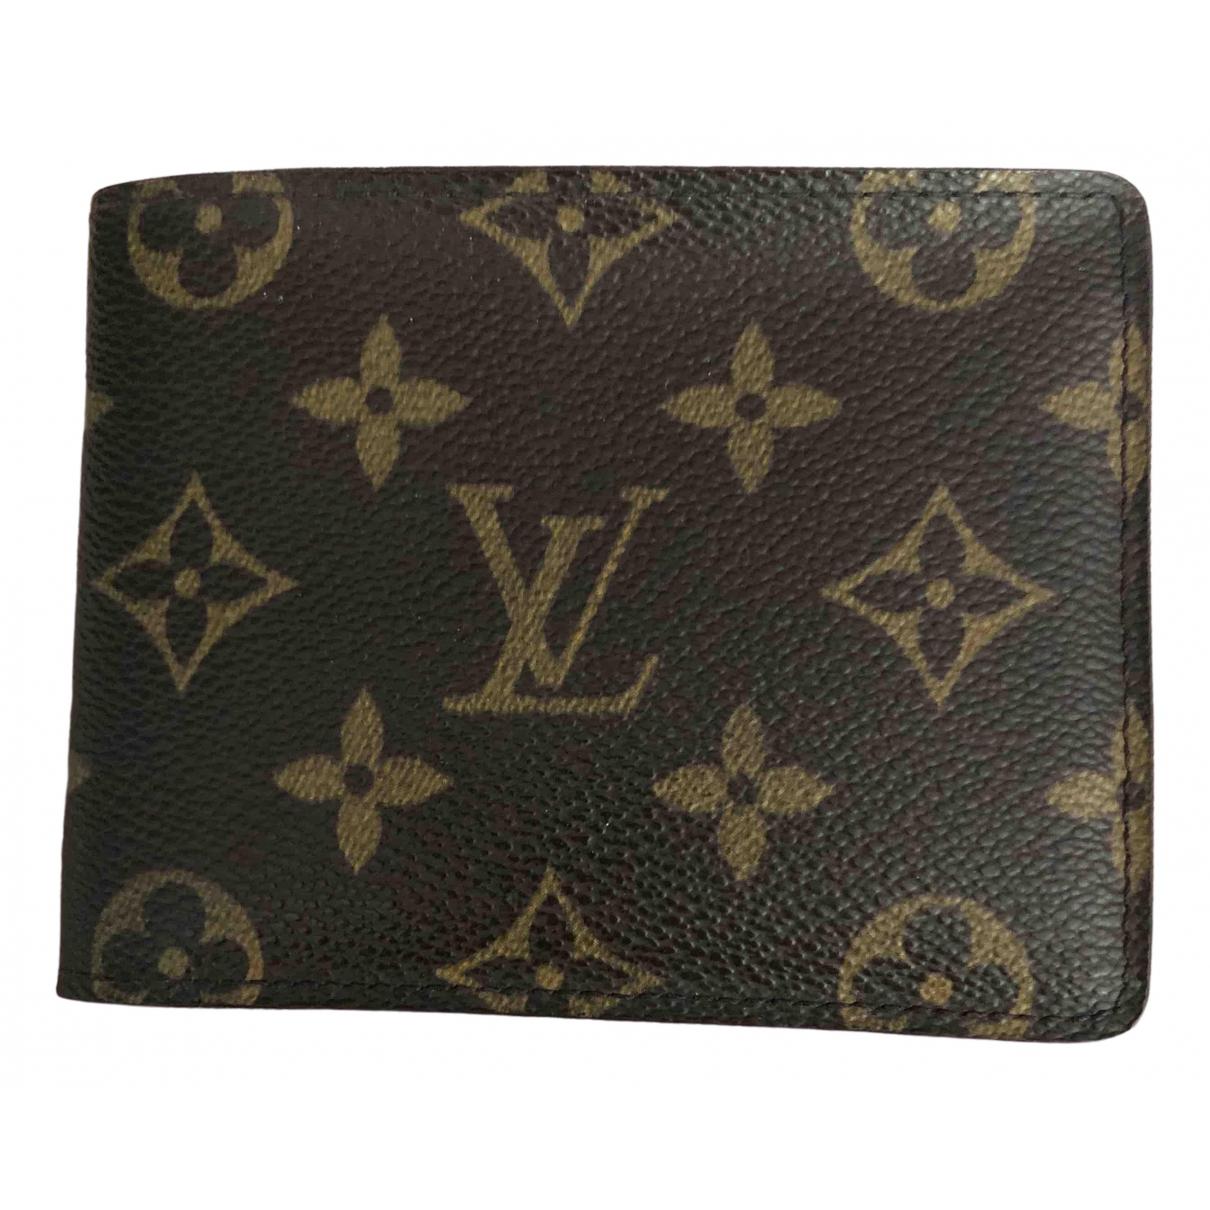 Marroquineria Multiple de Lona Louis Vuitton